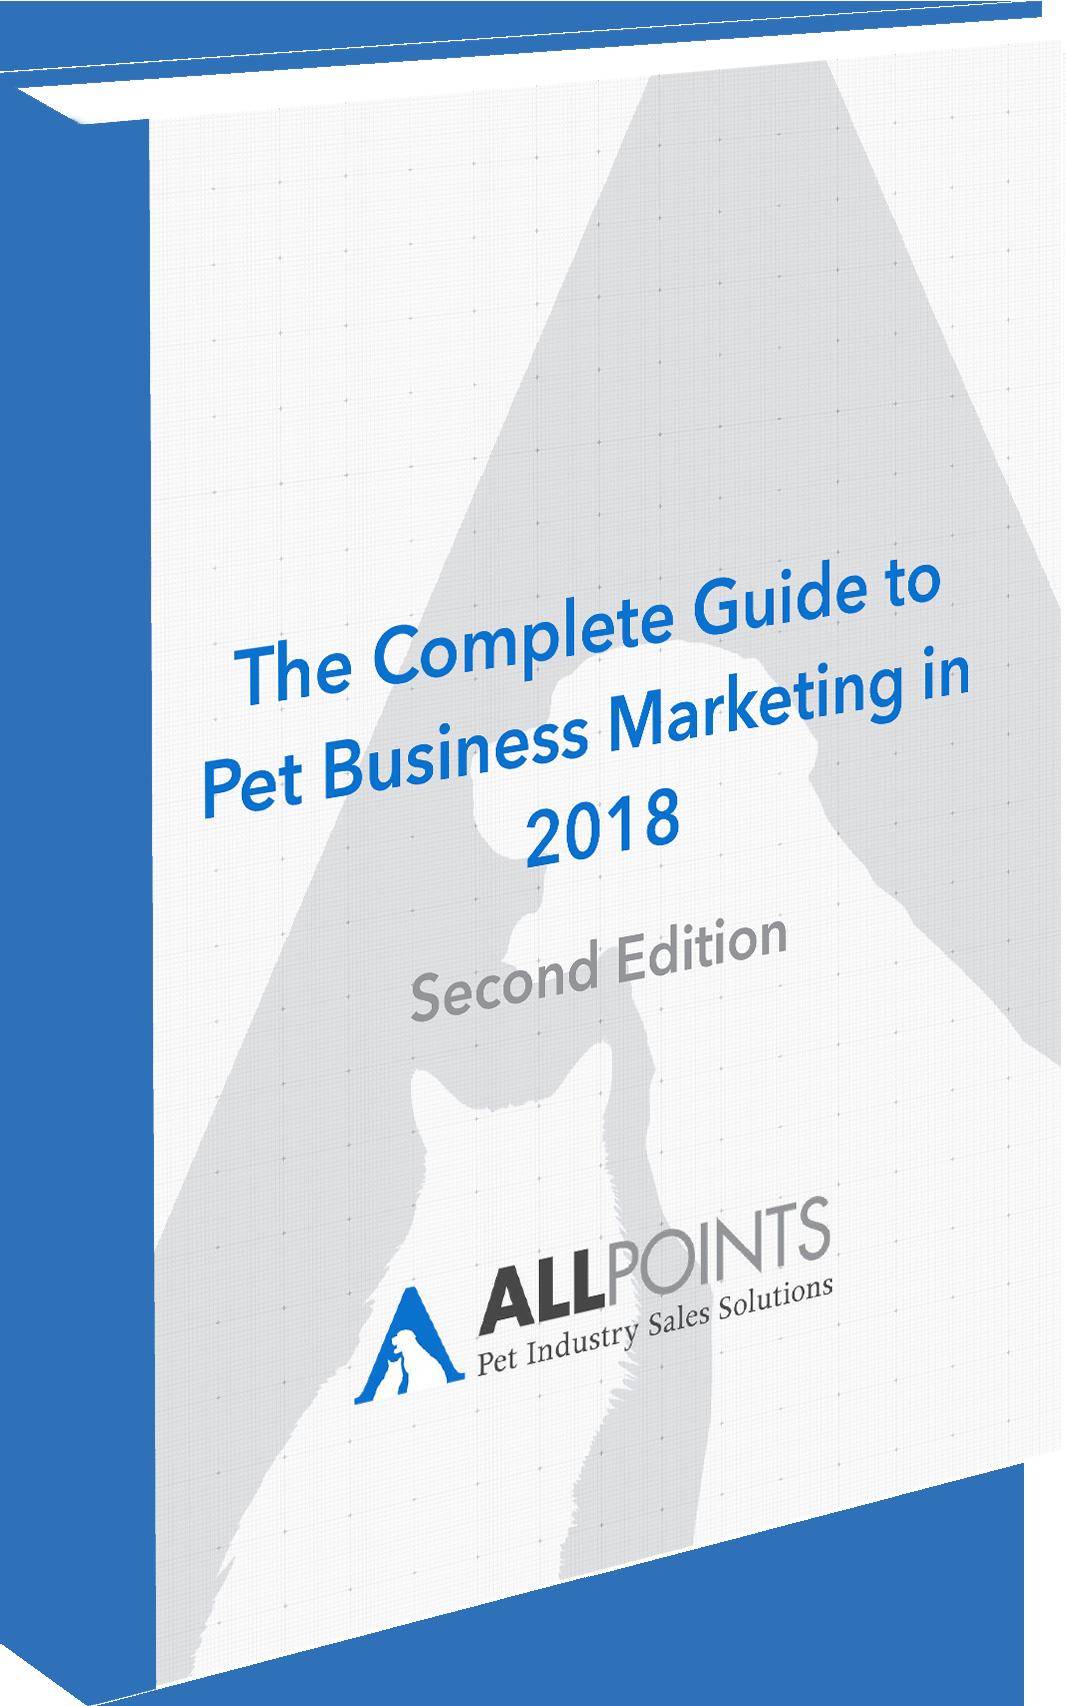 APM-eBook-Pet-Business-Marketing-Guide.png